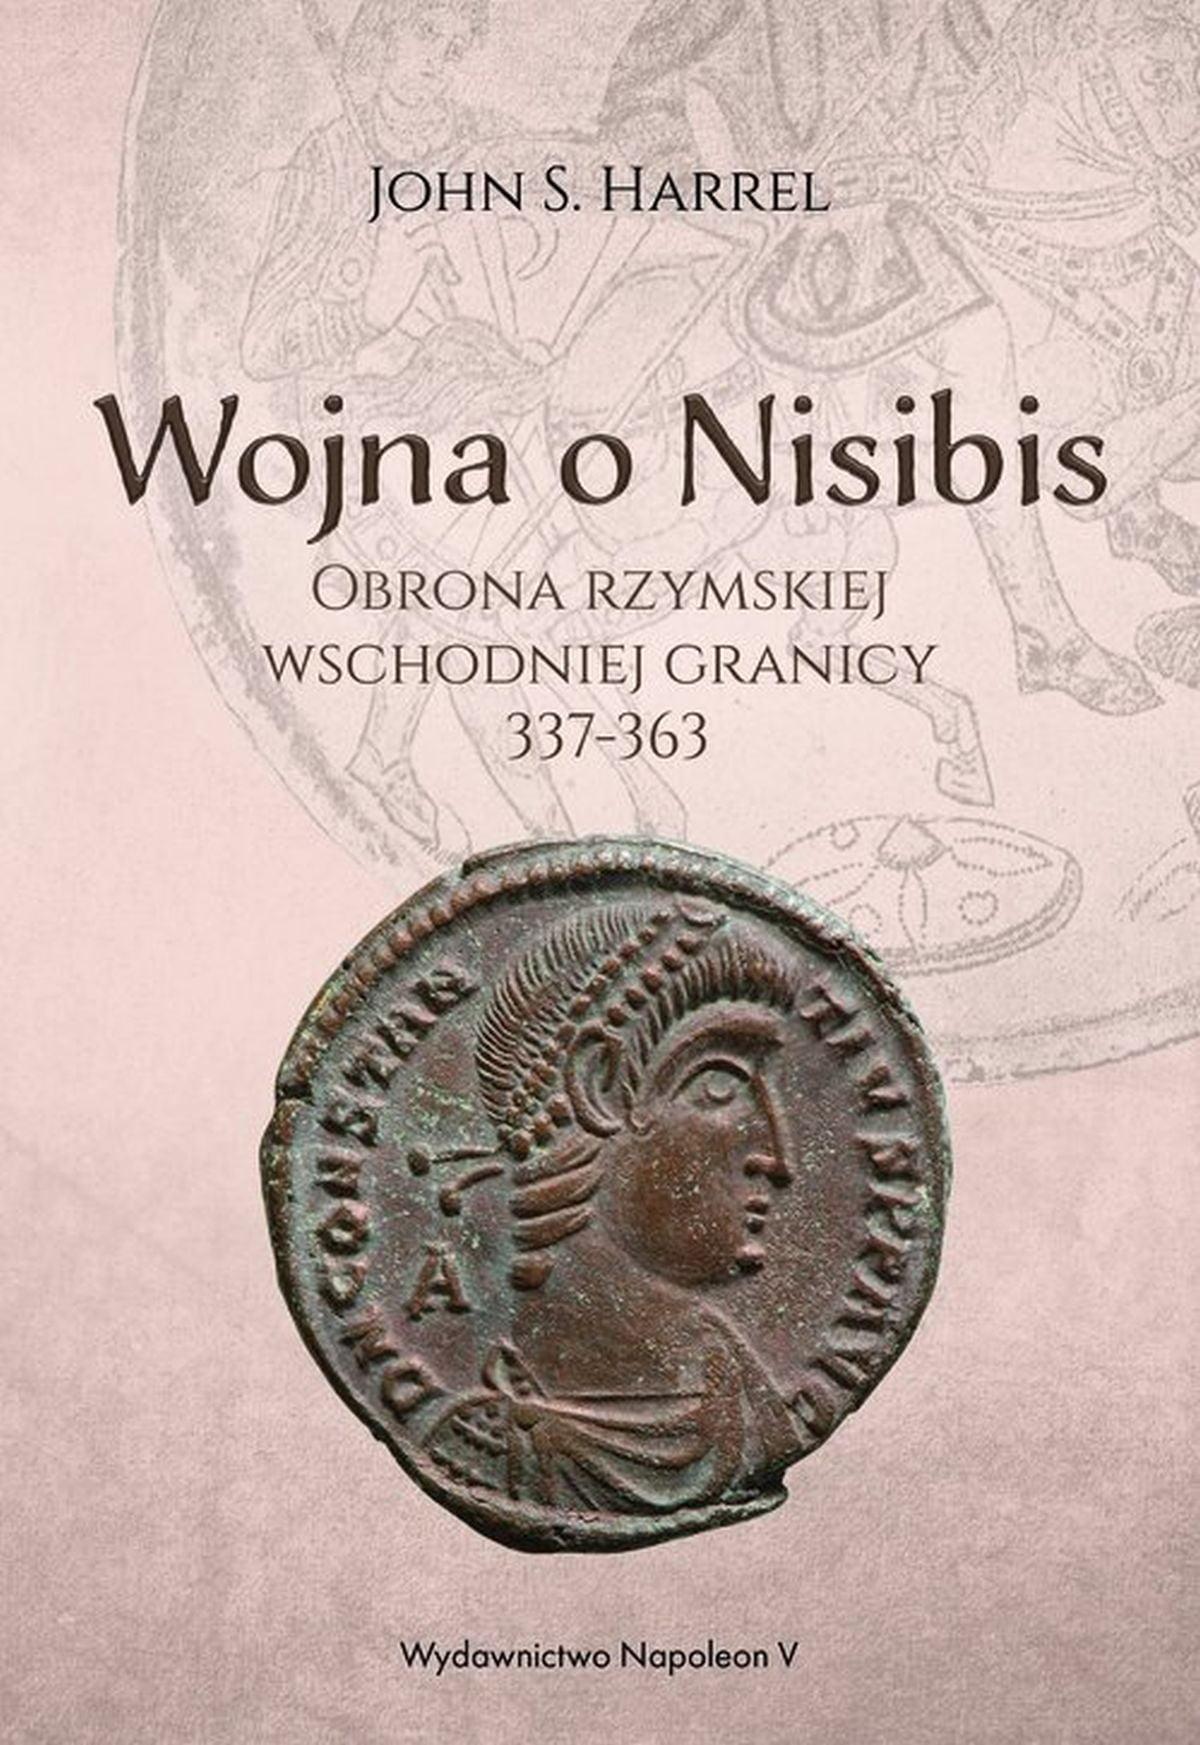 John S. Harrel, Wojna o Nisibis 337-363